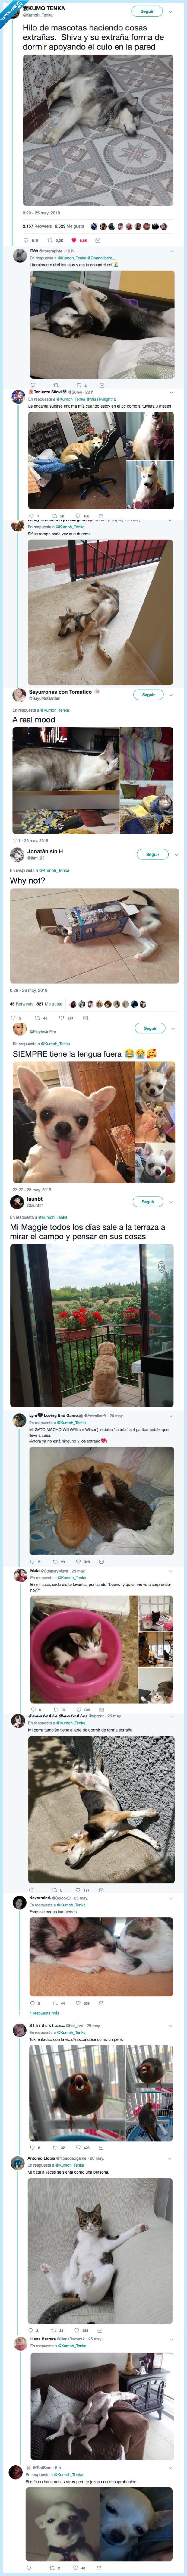 gato,hamster,mascotas,perro,twitter